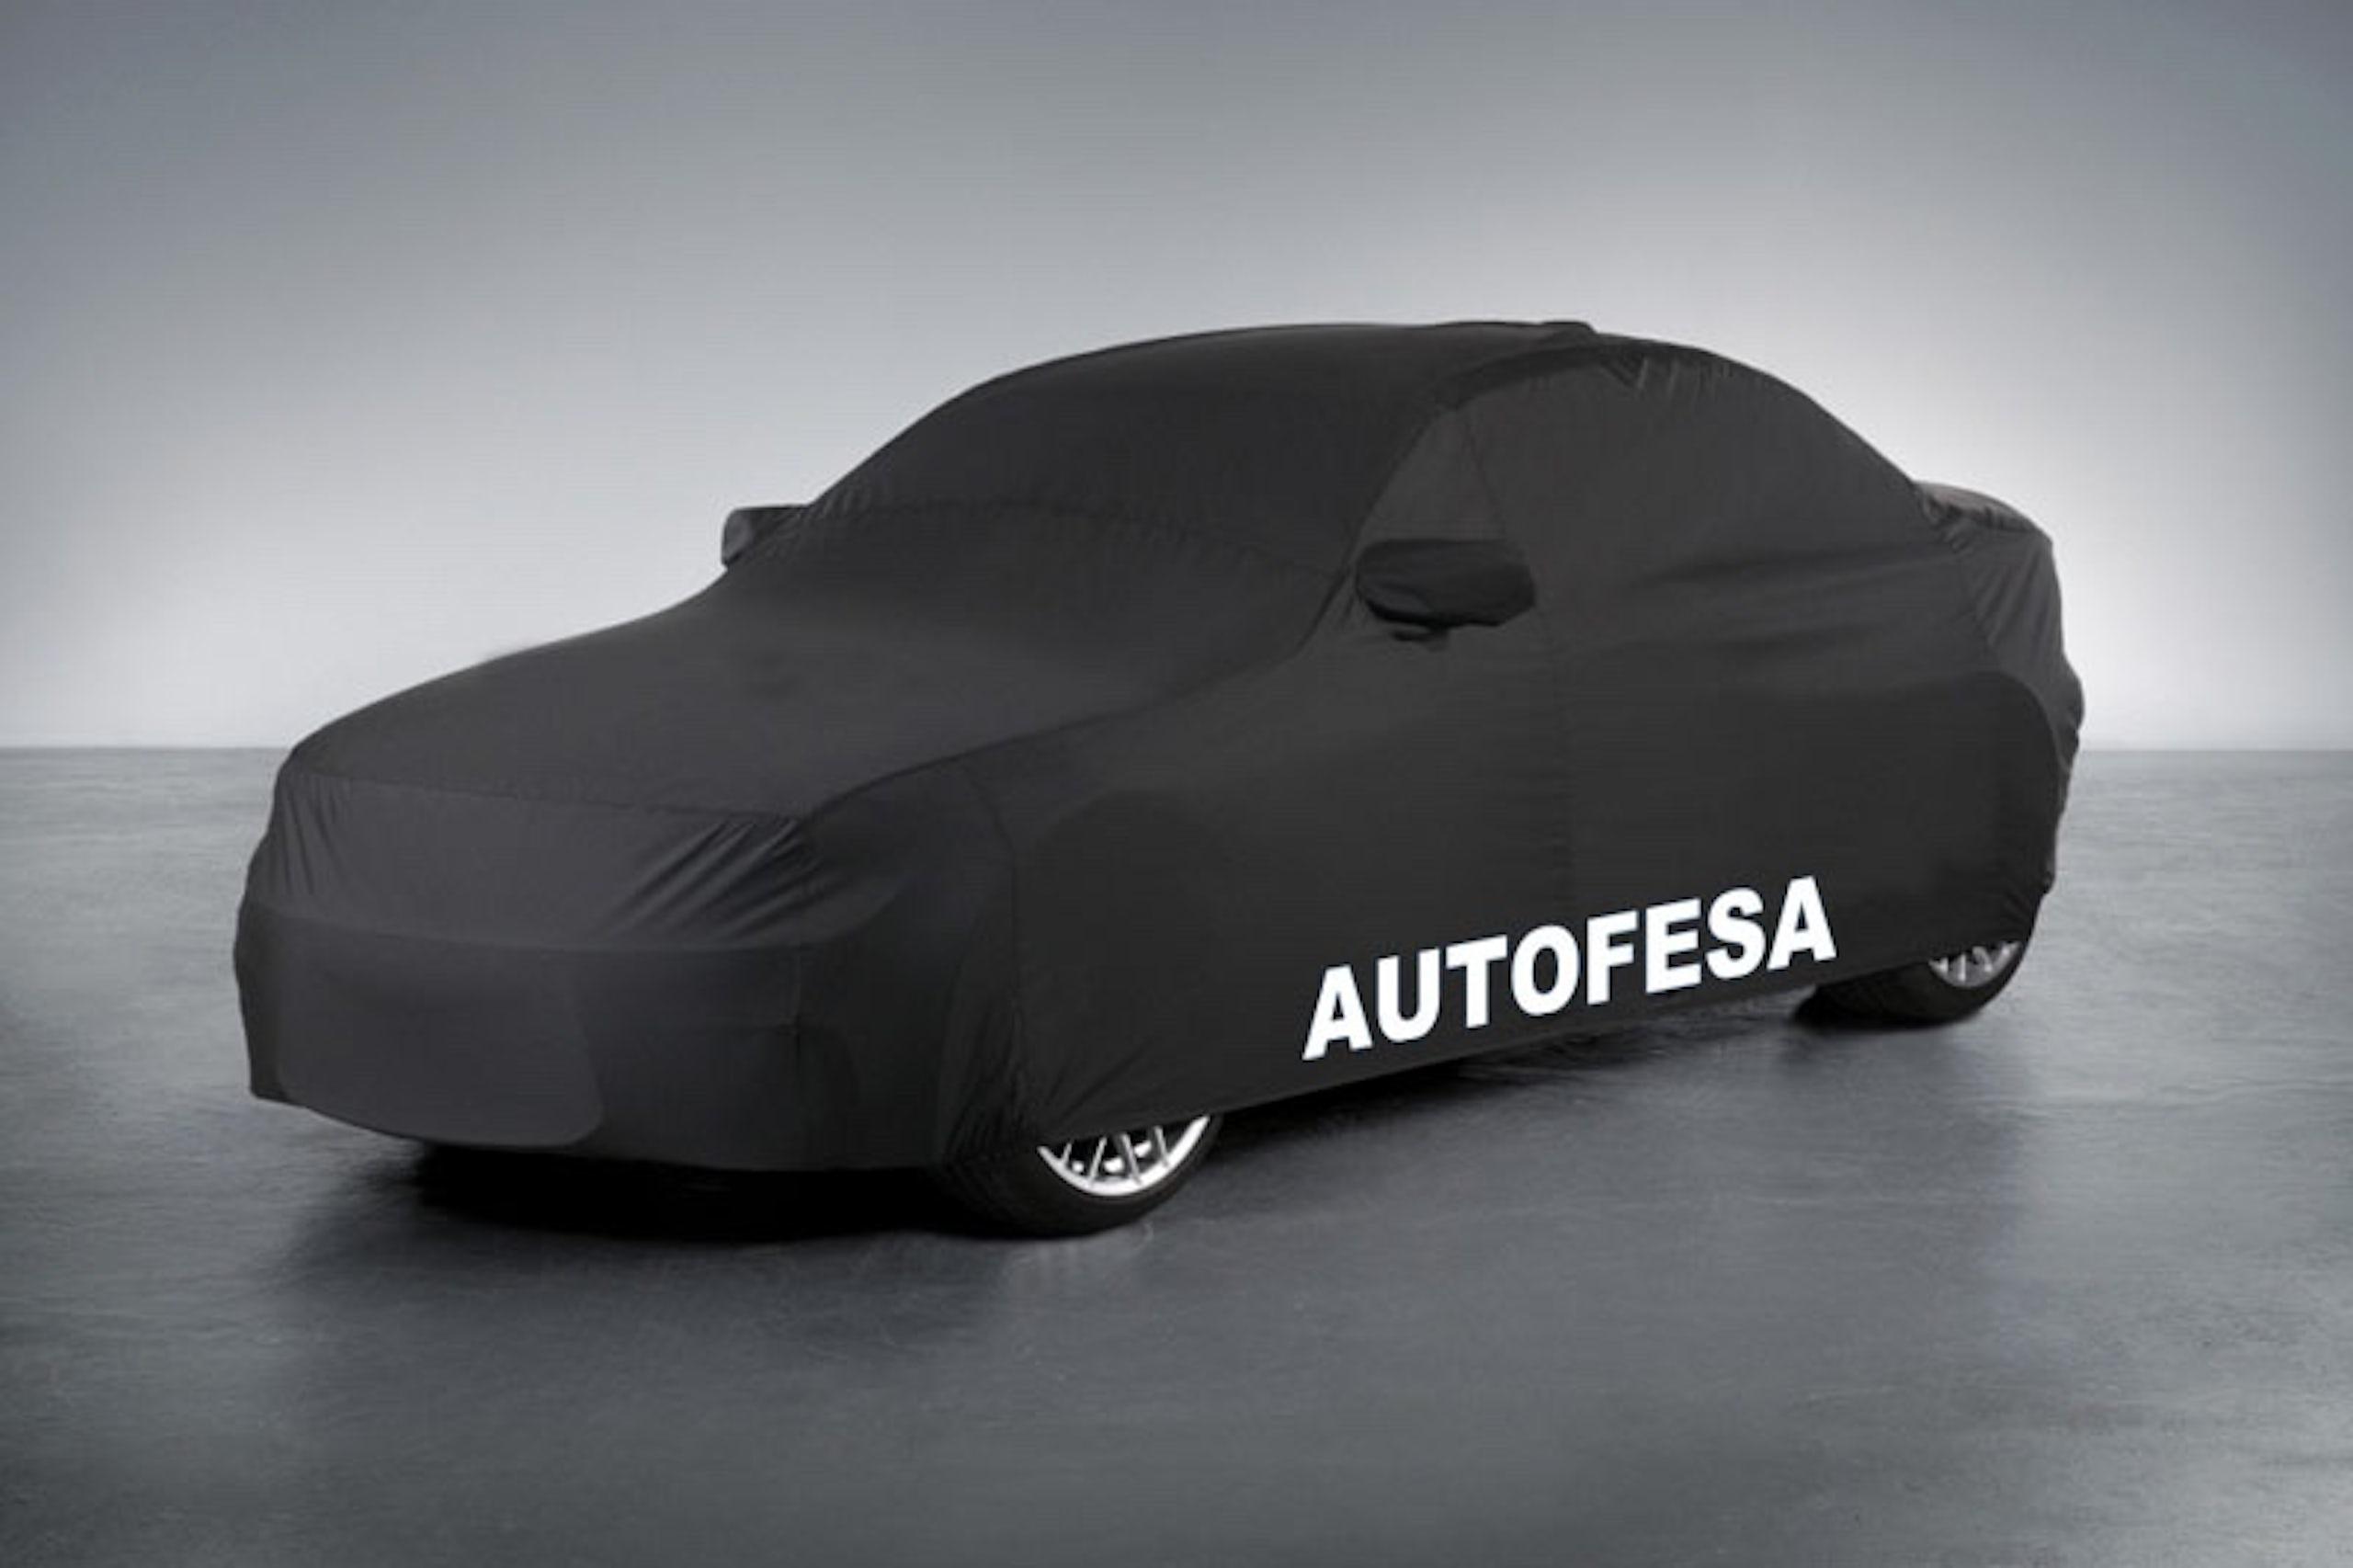 Audi A6 A6Avant COMPETITION ABT 3.0 TDI V6 T 326cv quattro 5p S tronic 4x4 Cpmpetition ABT S/S - Foto 25